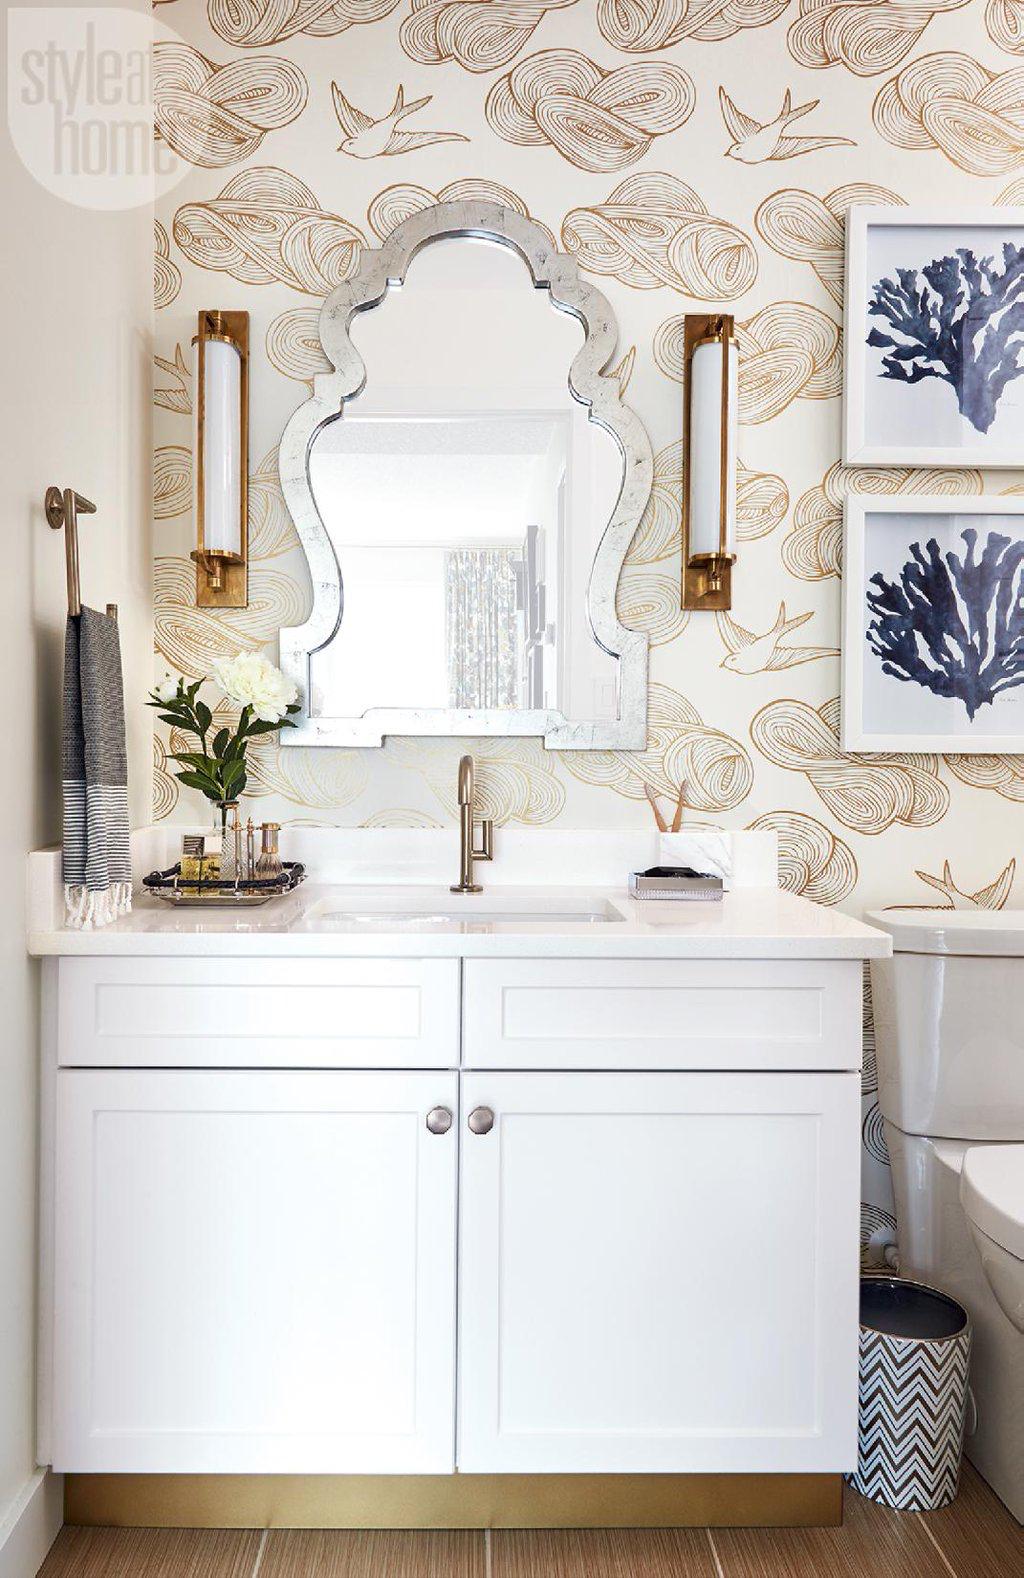 Girls bathroom | Future home | Pinterest | Girl bathrooms, Hall ...